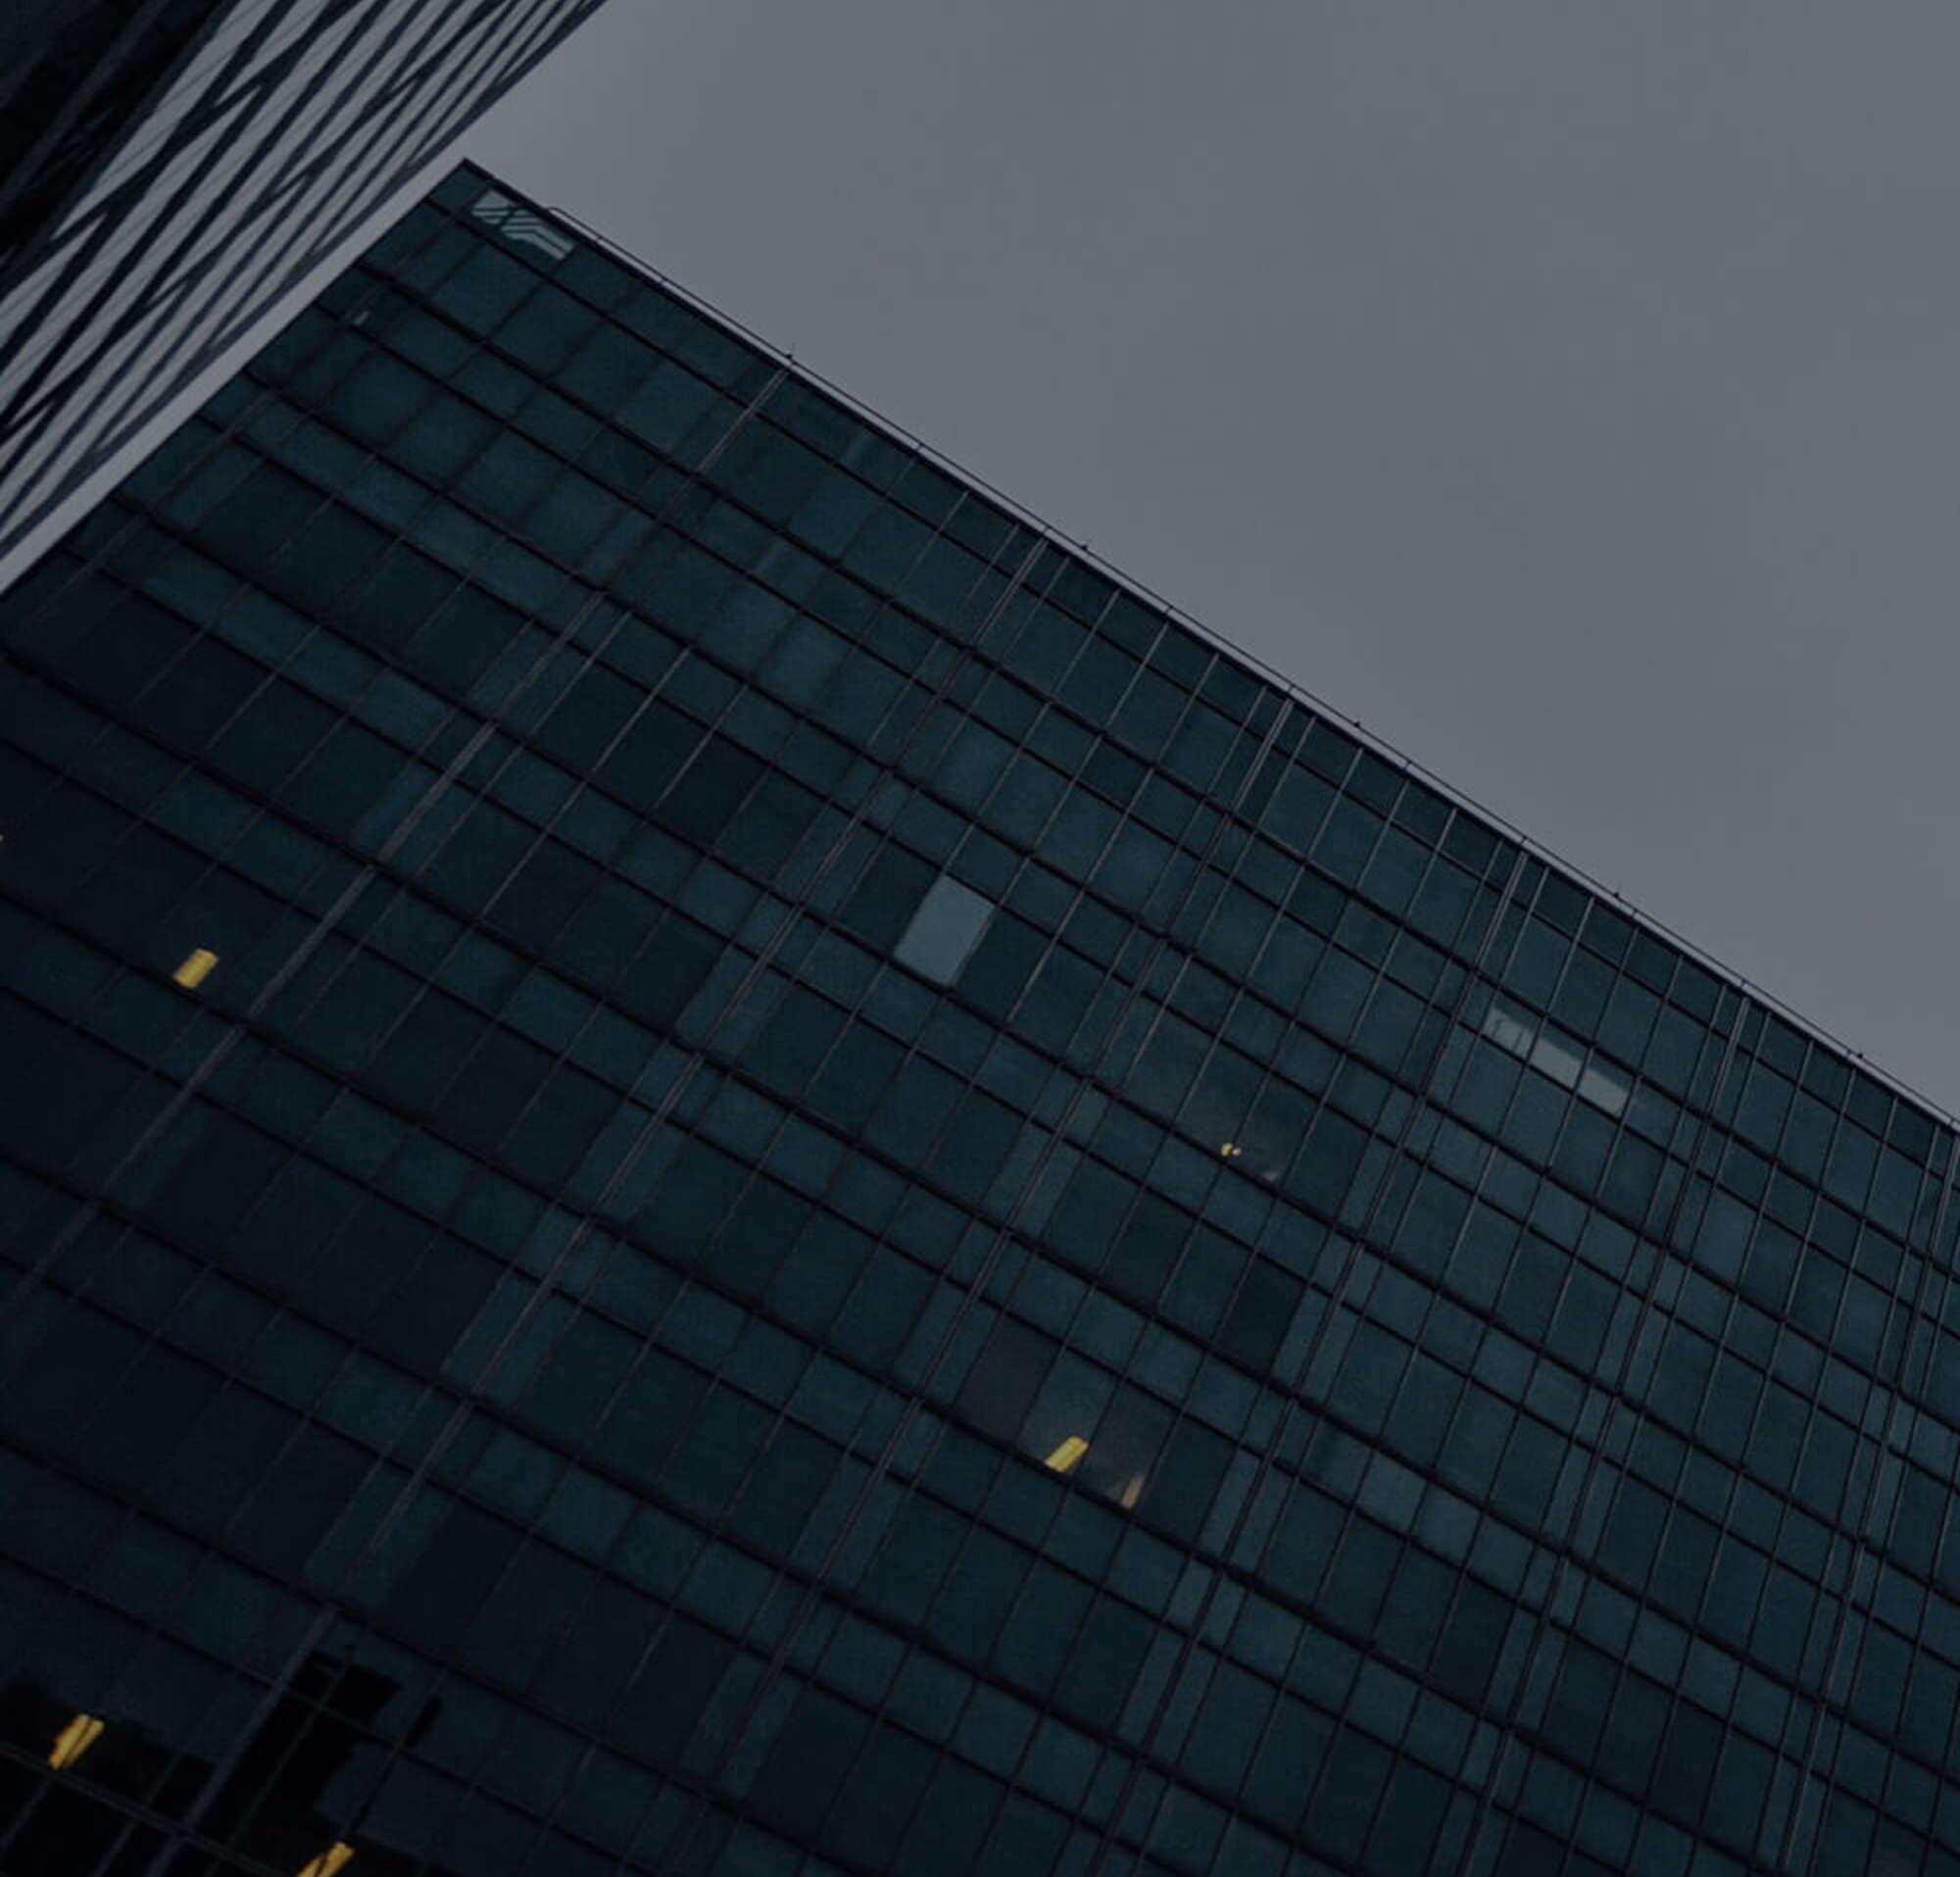 skyscraper office building representing DocuSign legal department client locations.